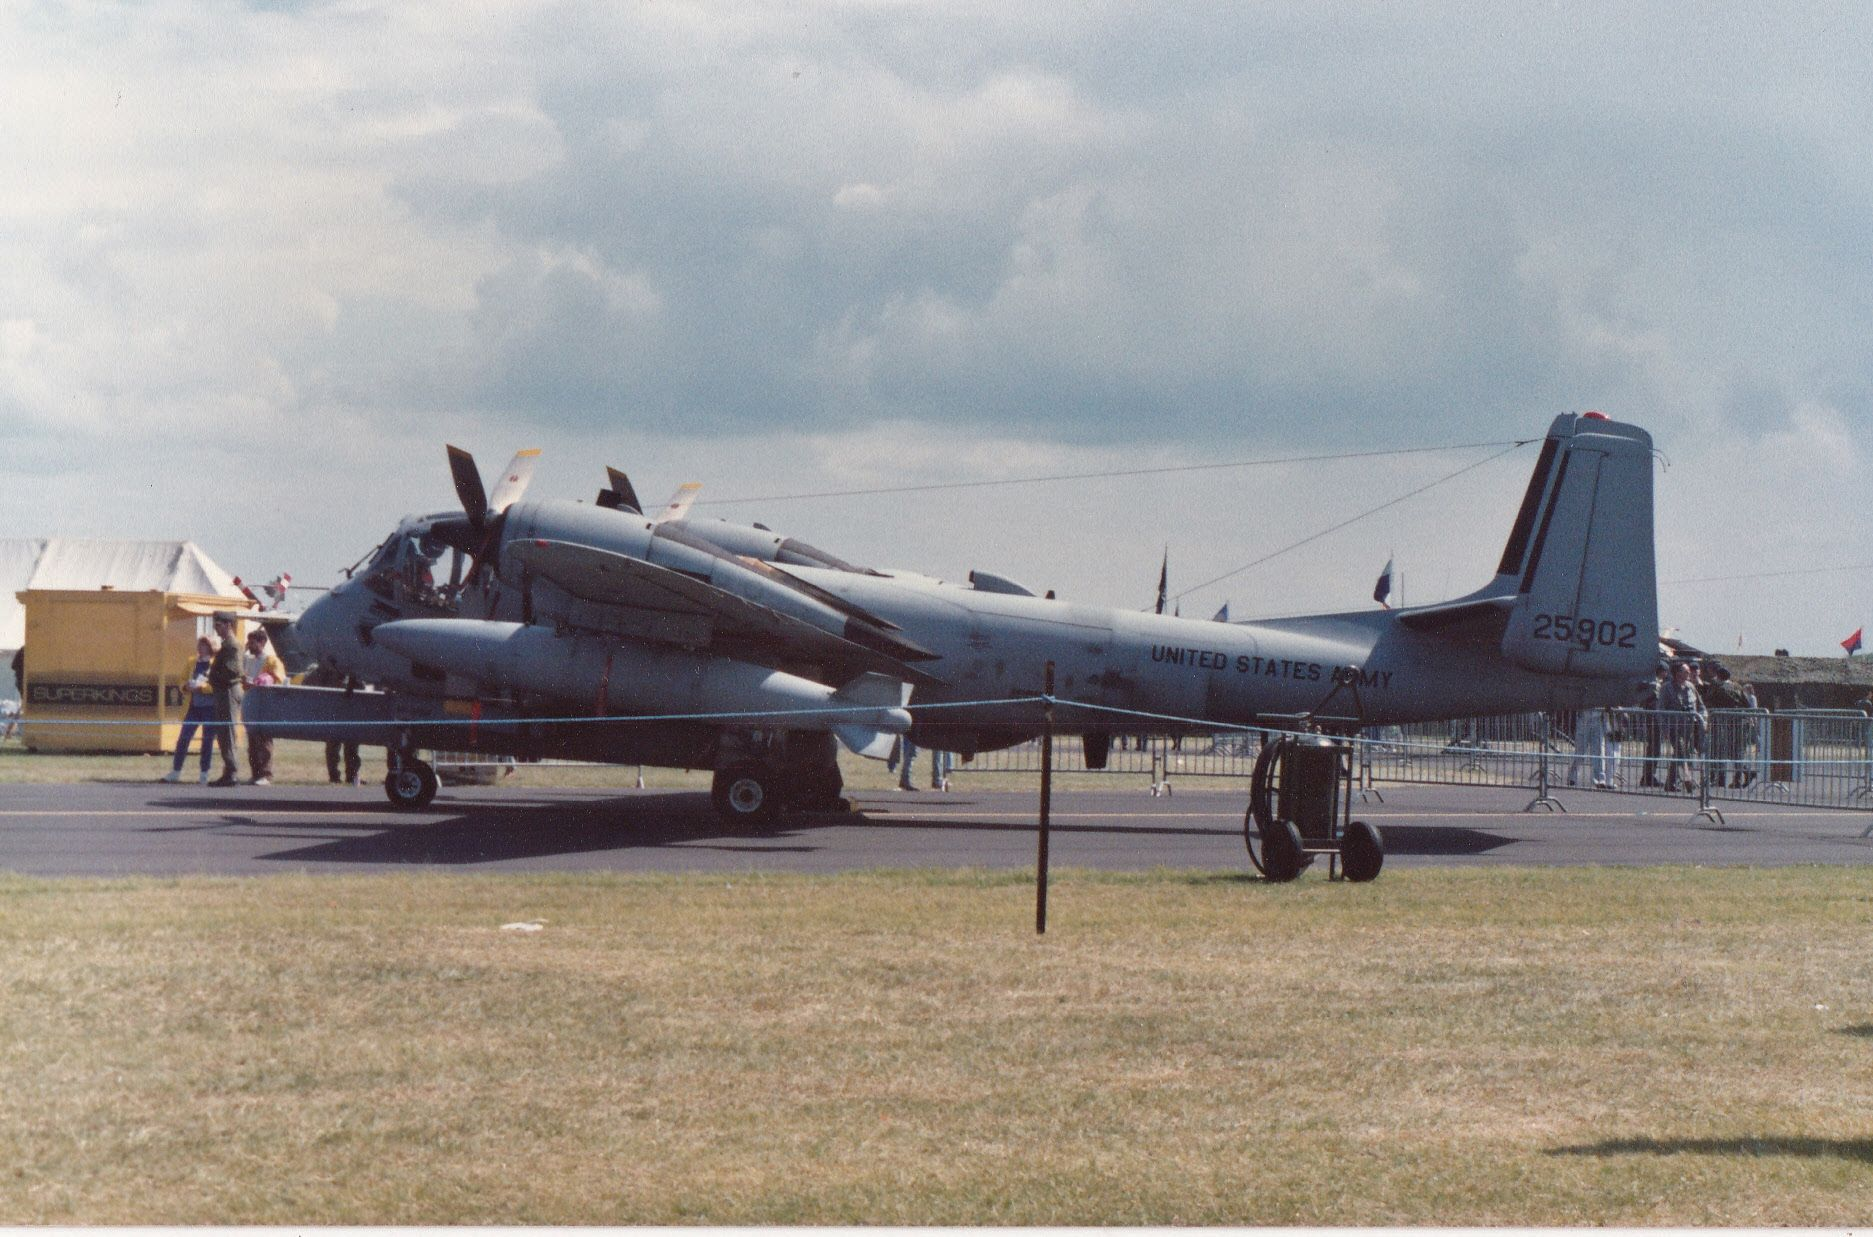 Mohawk 25902 ov1d fighter jets aircraft aviation